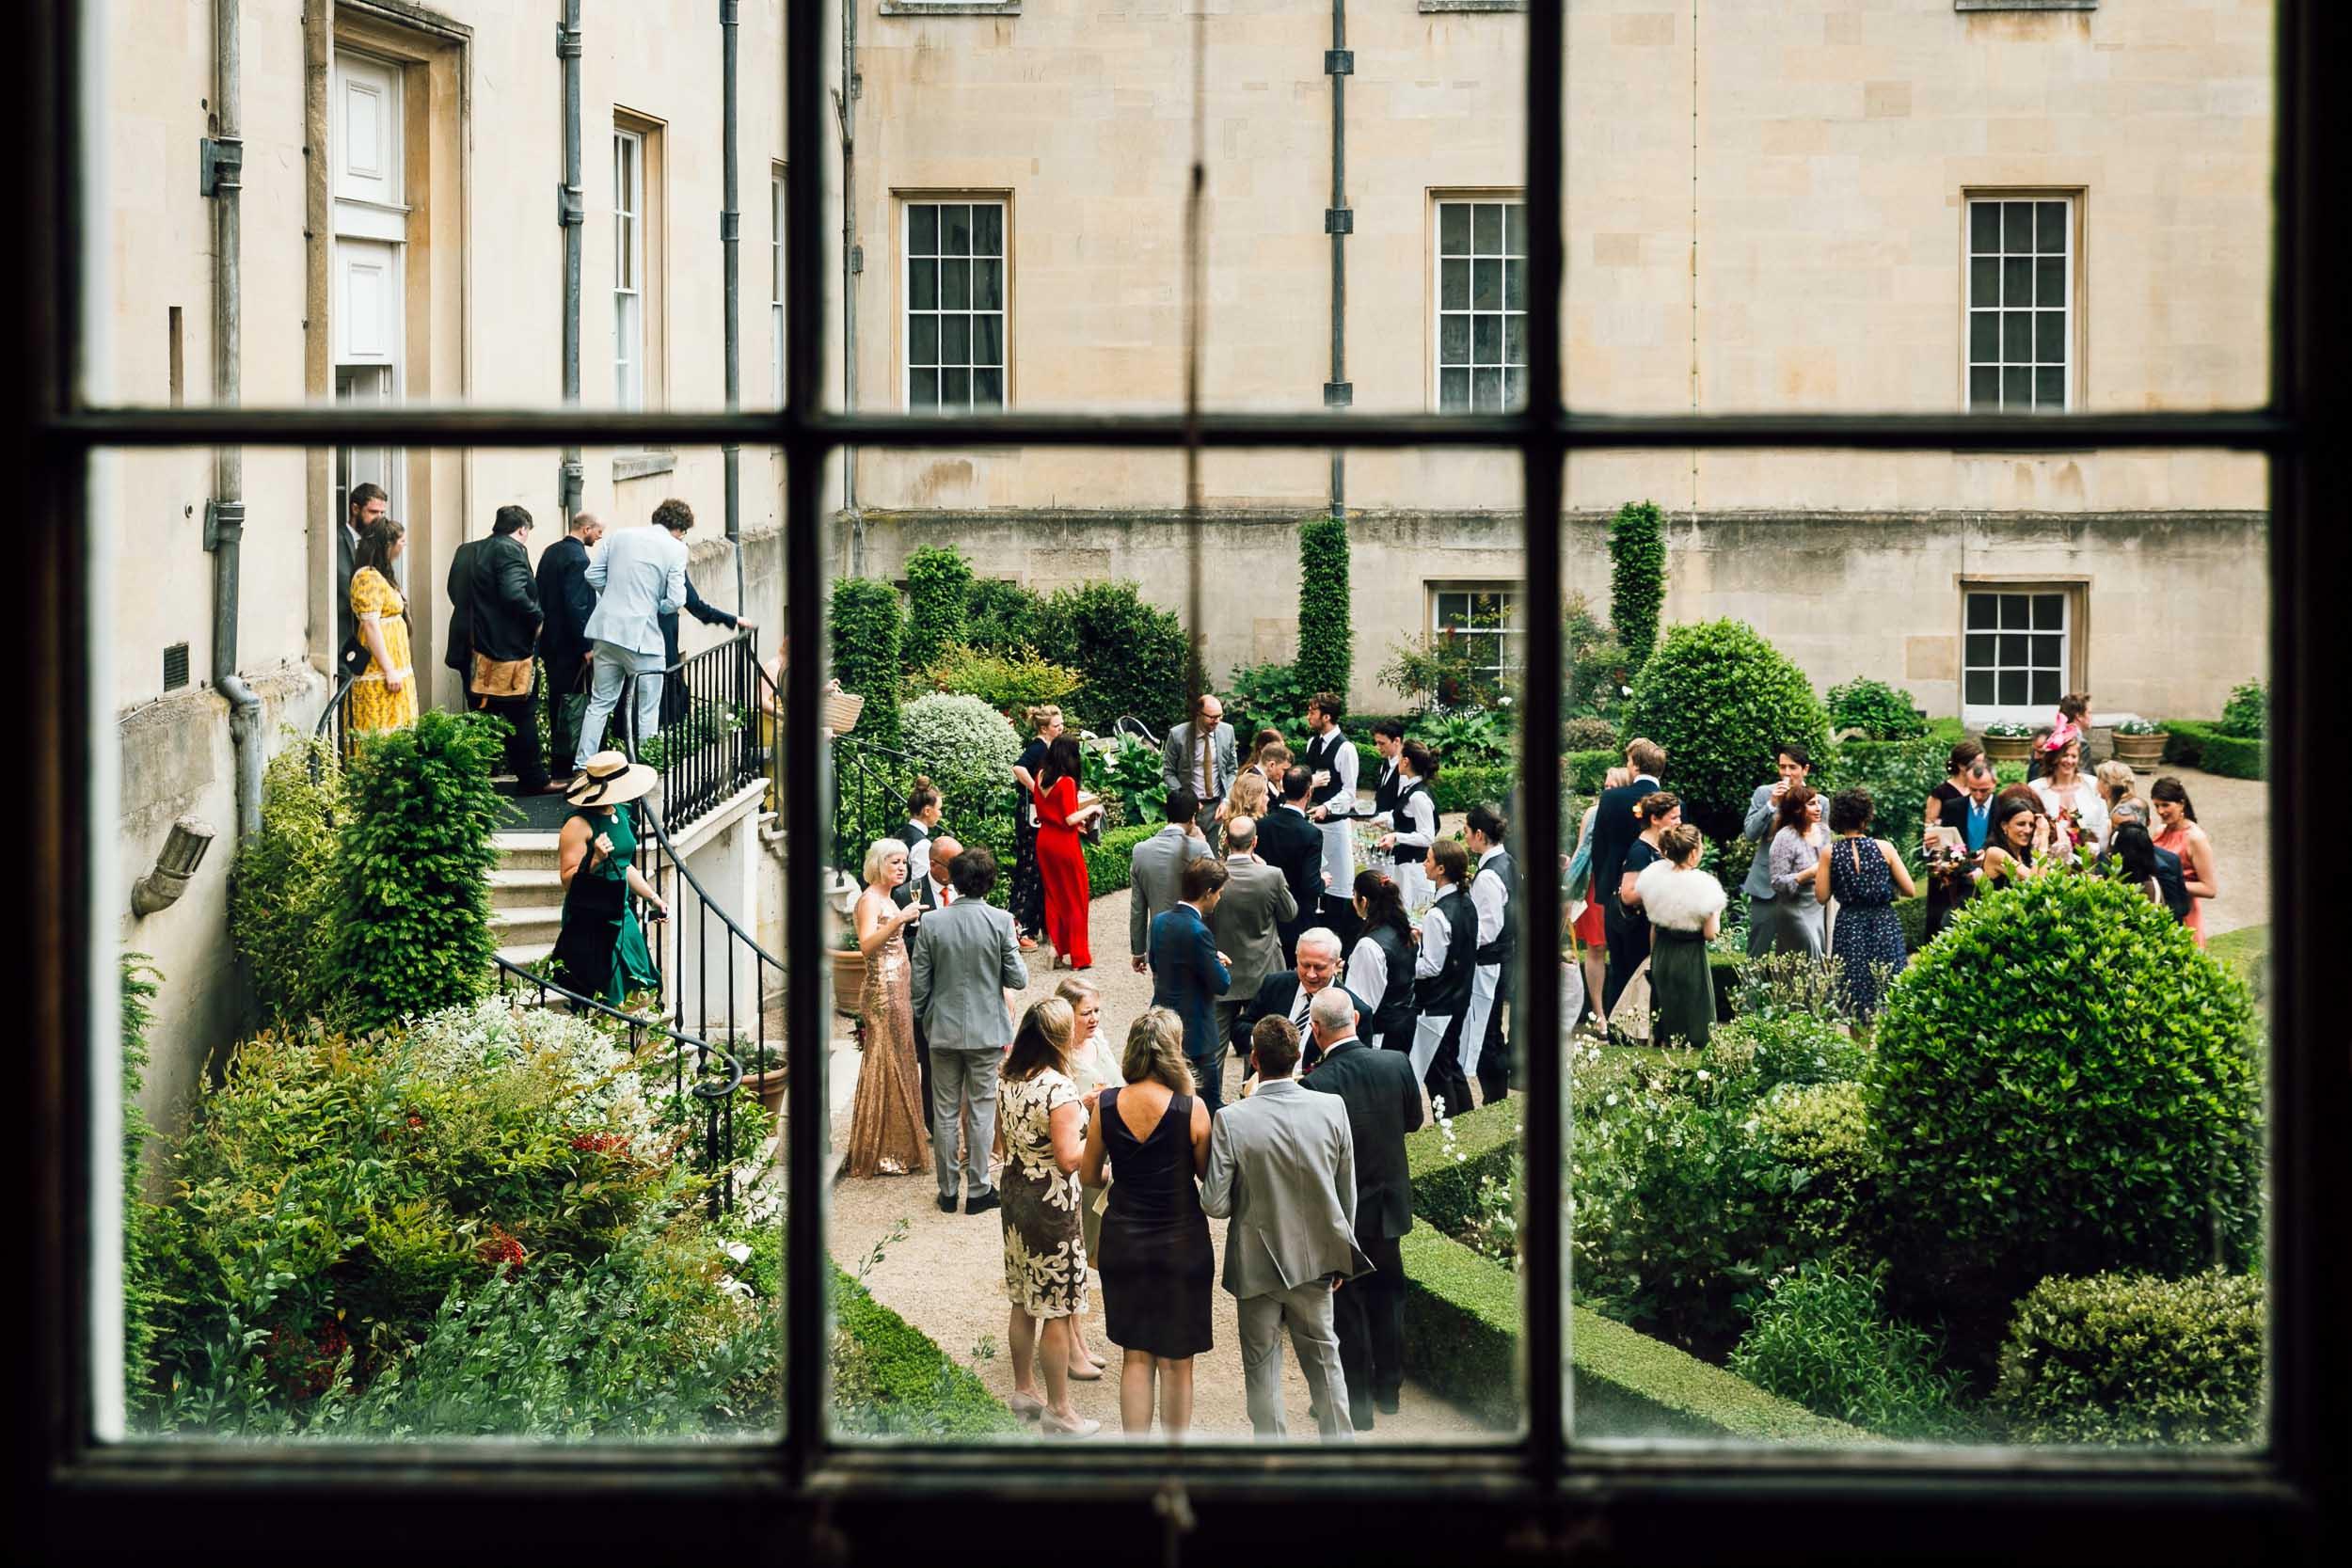 syon-house-wedding-photographer-london 078.jpg